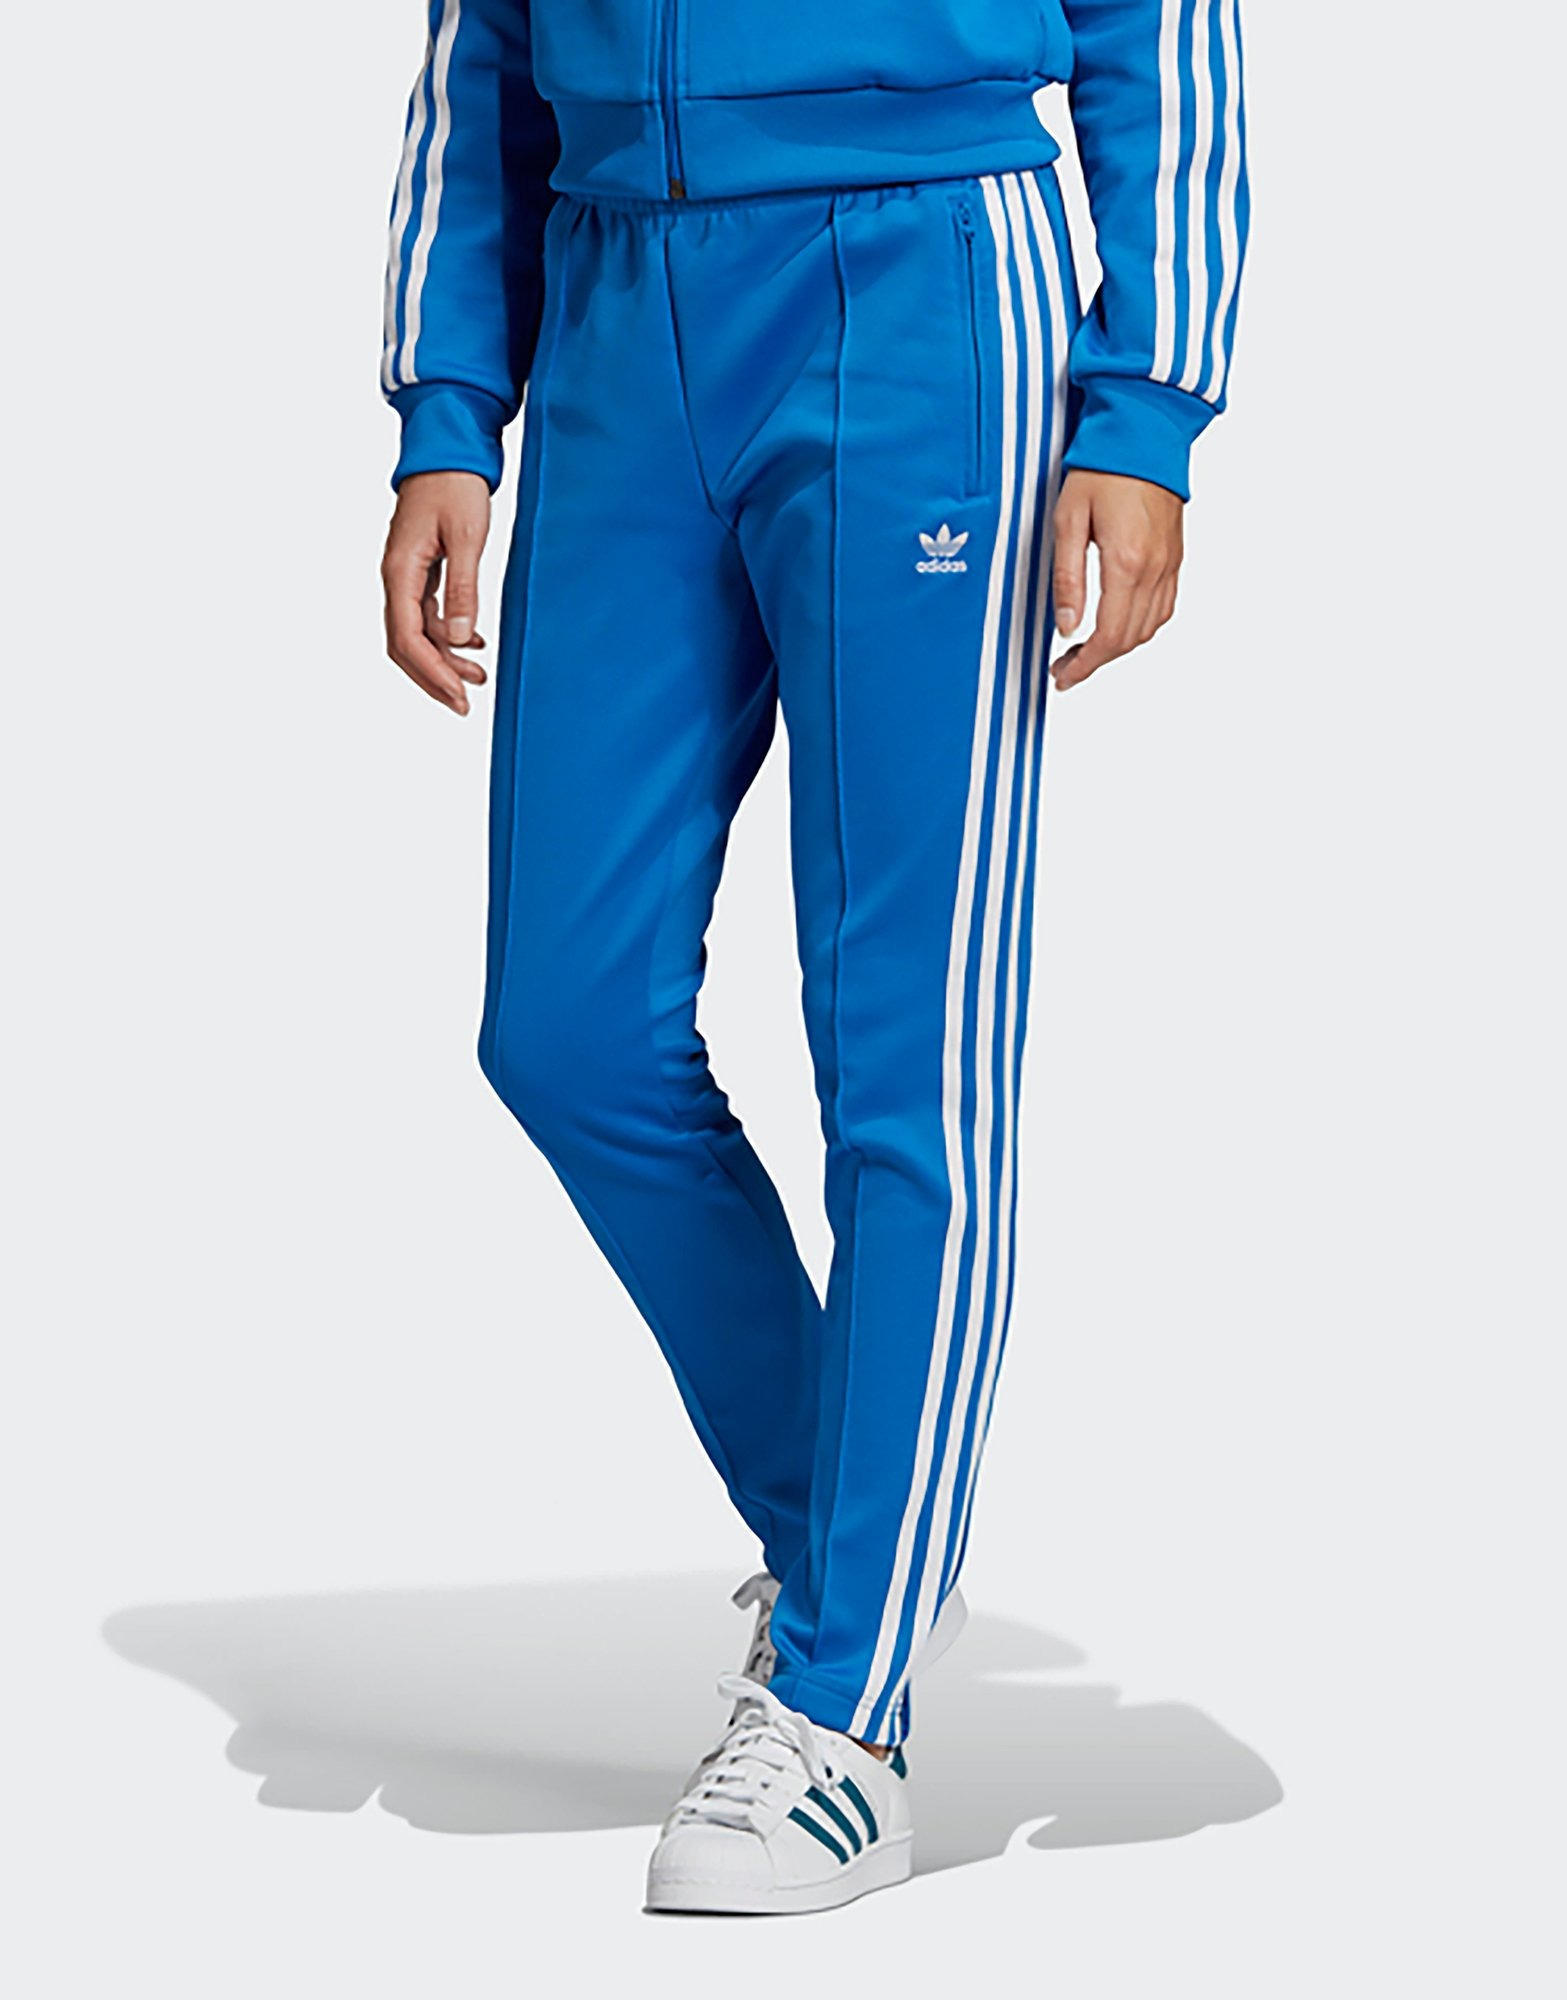 Adidas Originals Sst Tracksuit Bottom by Adidas Originals